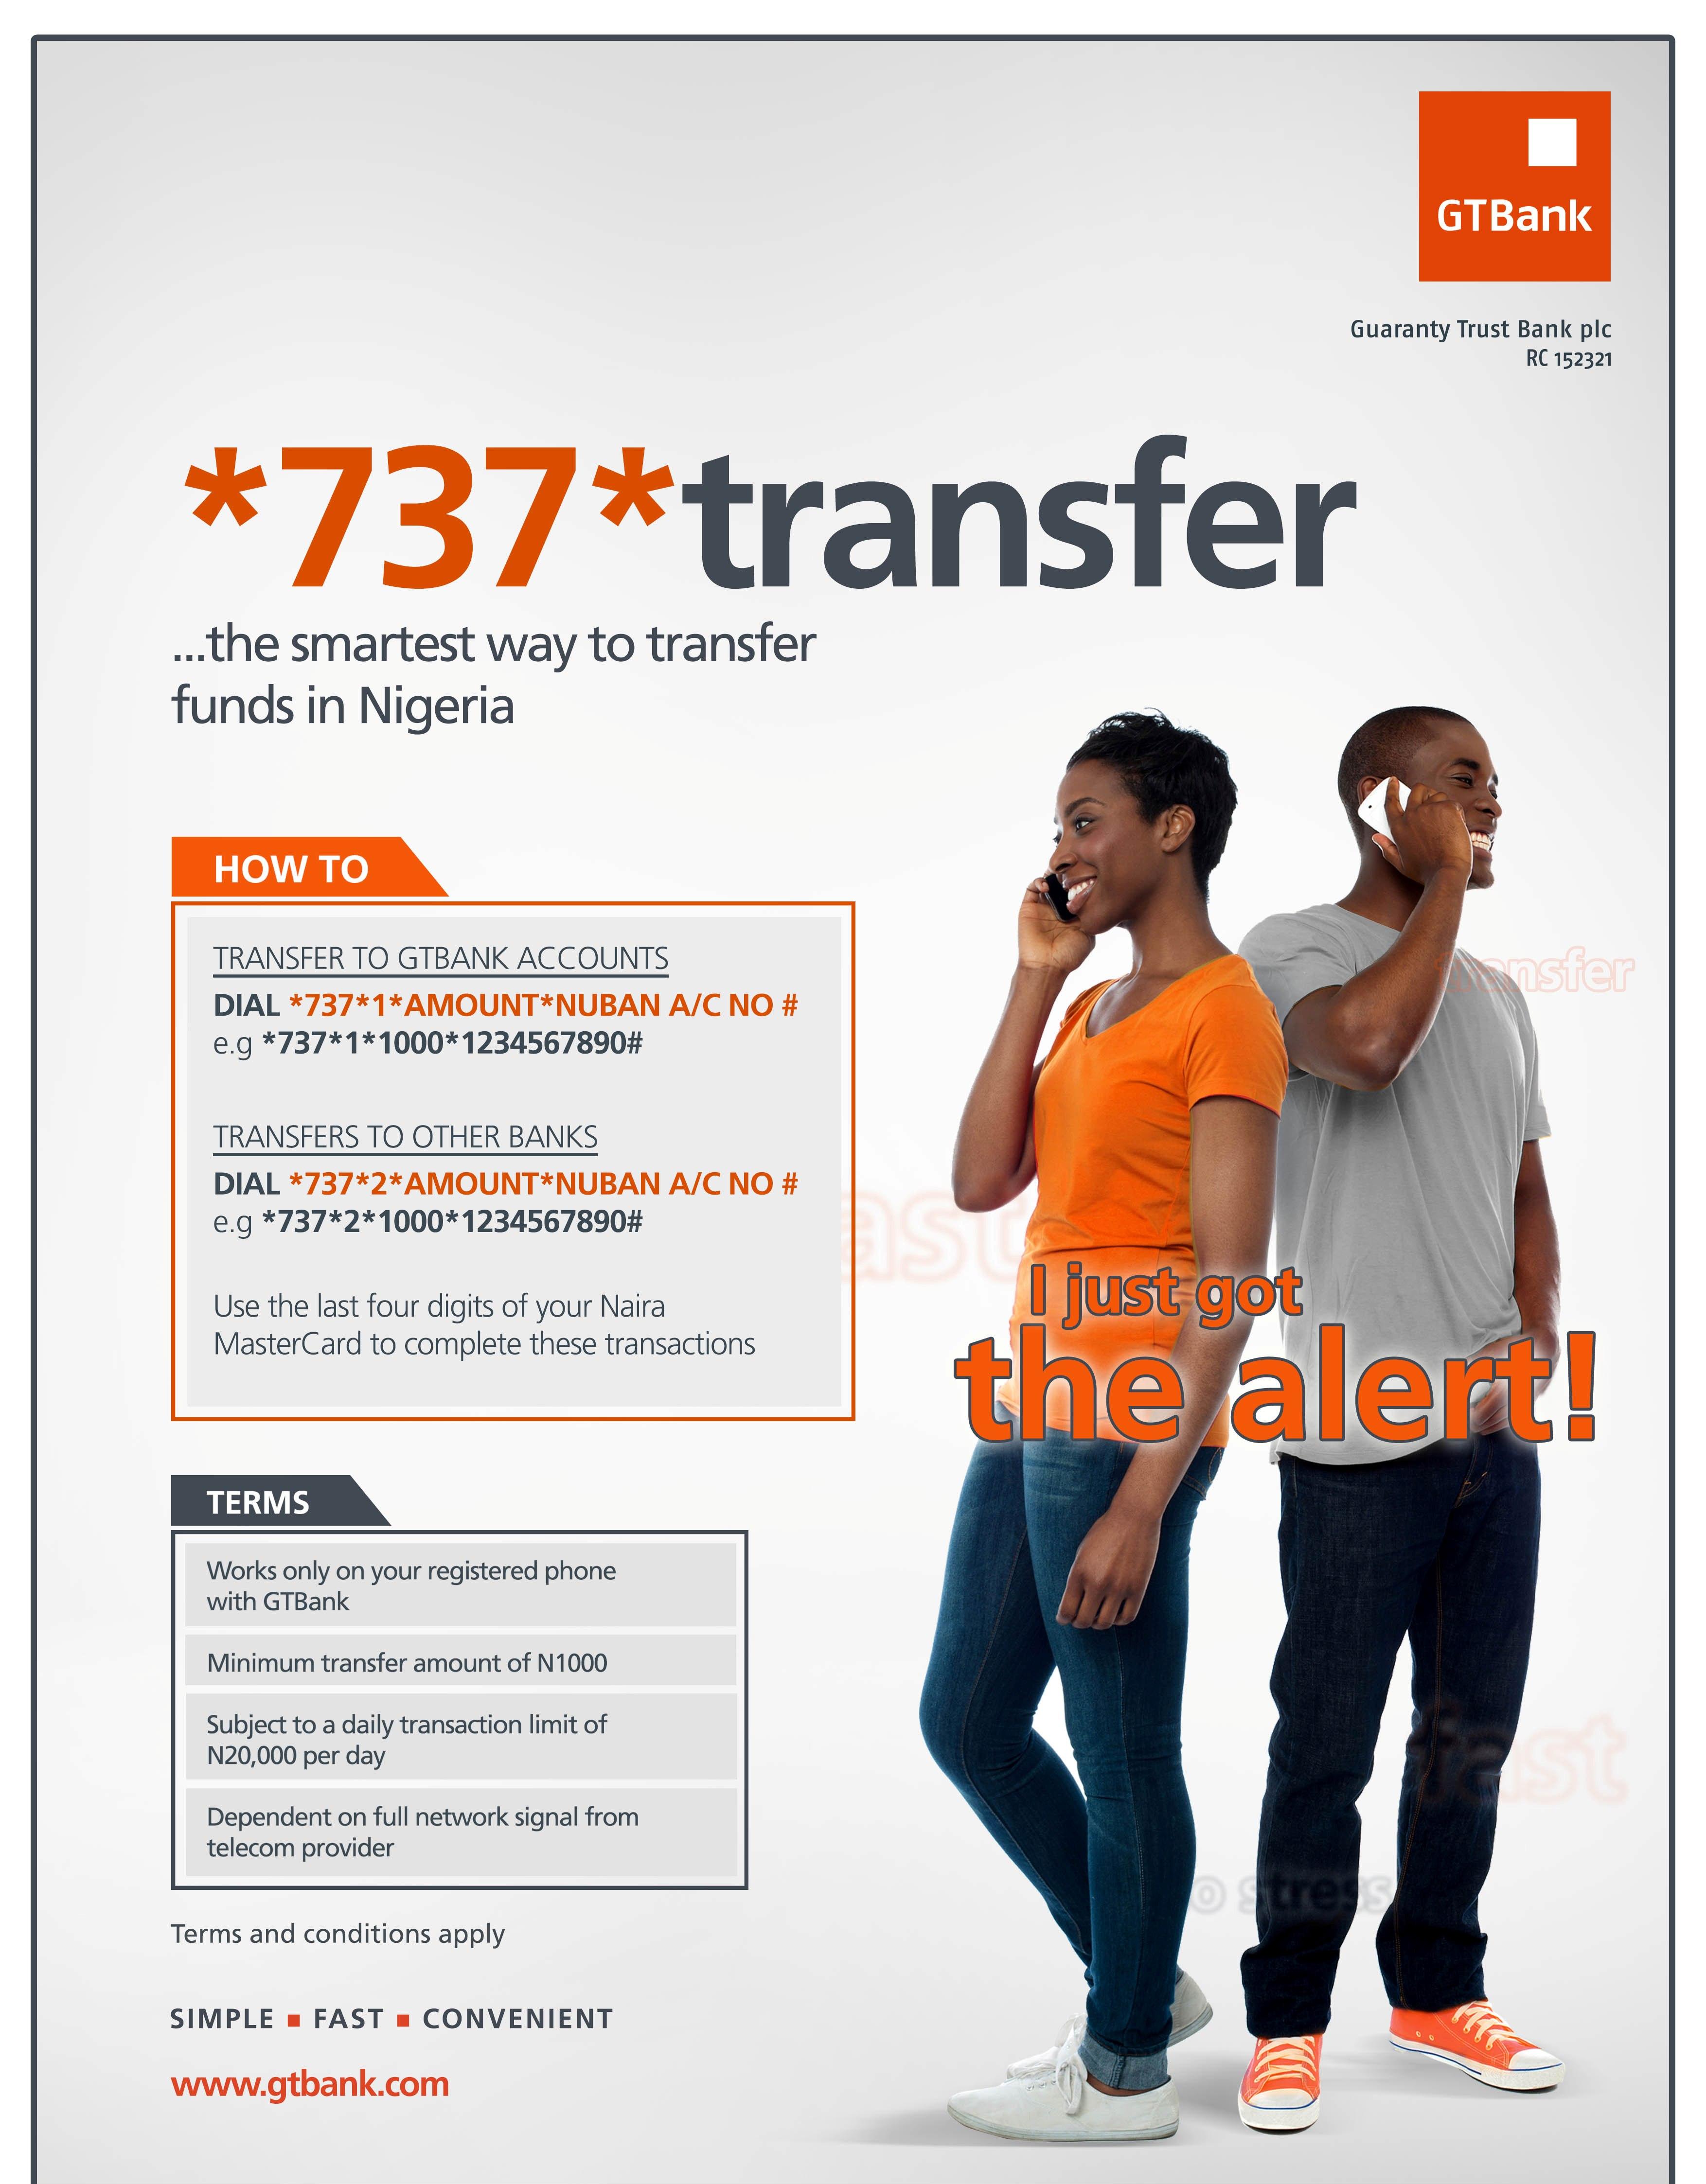 GTB 737 service